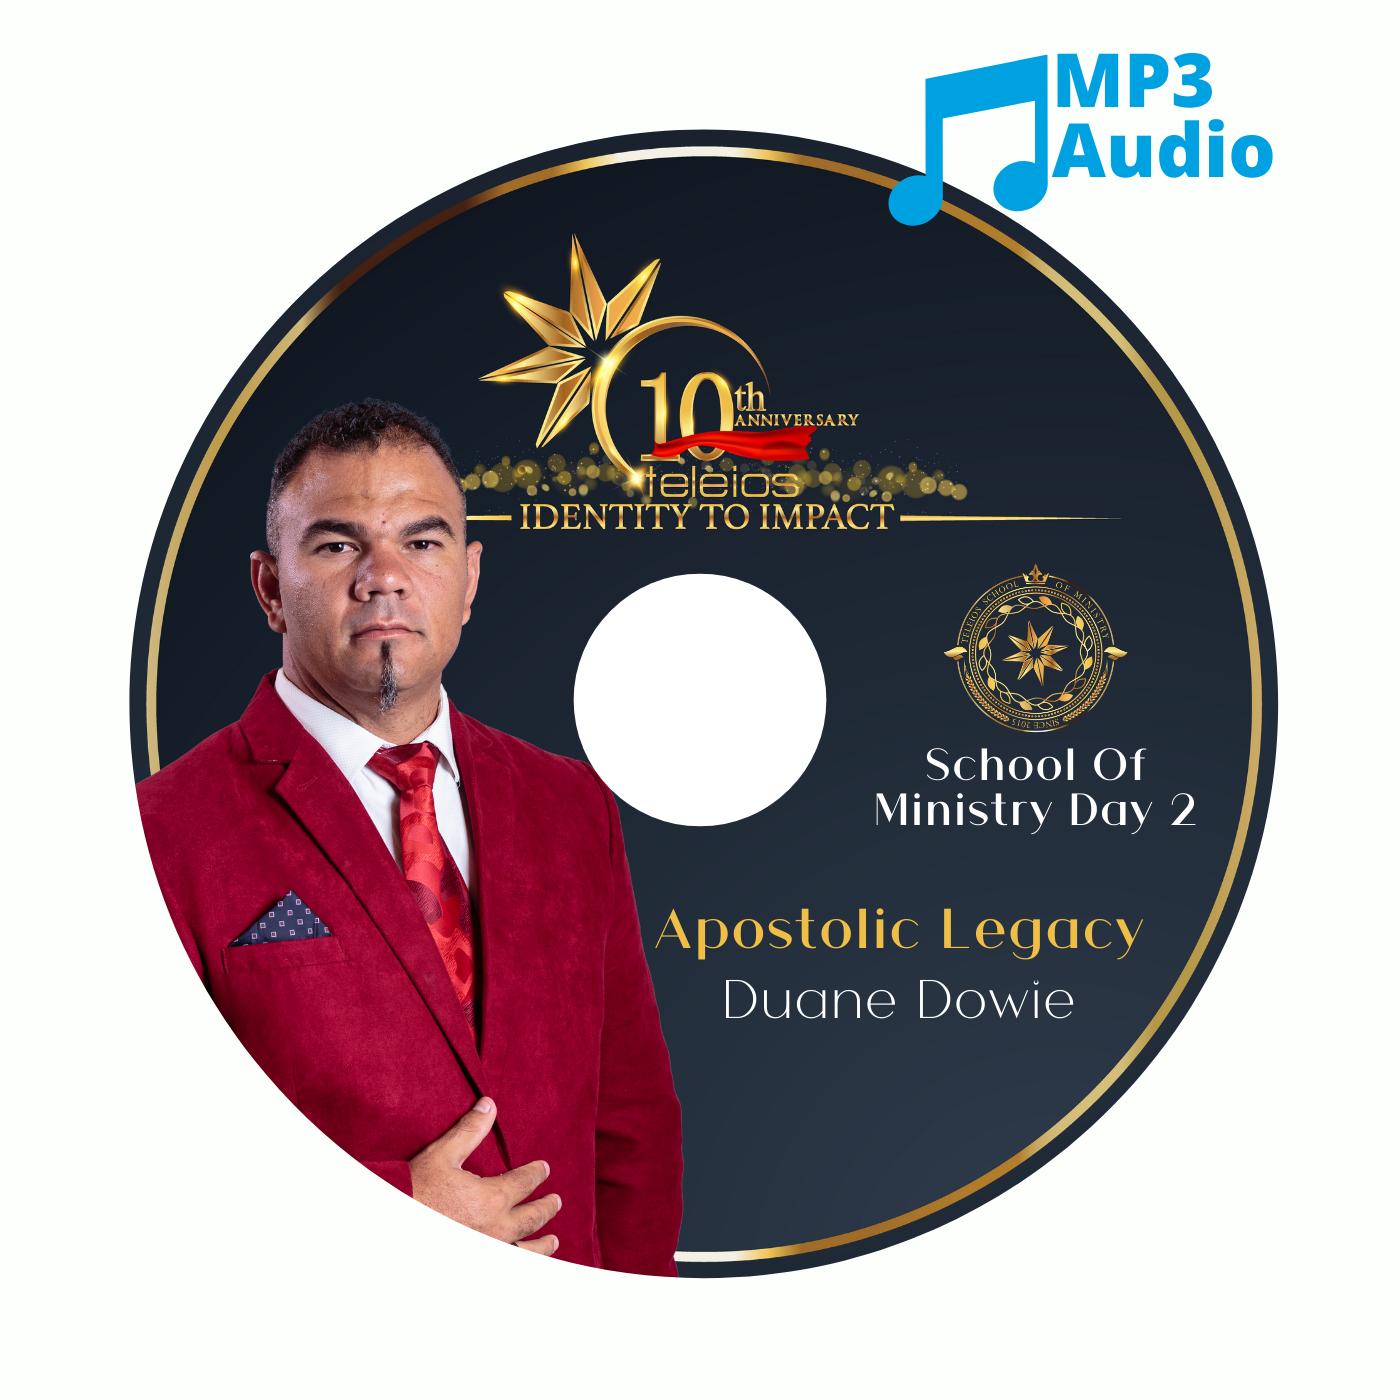 Apostolic Legacy